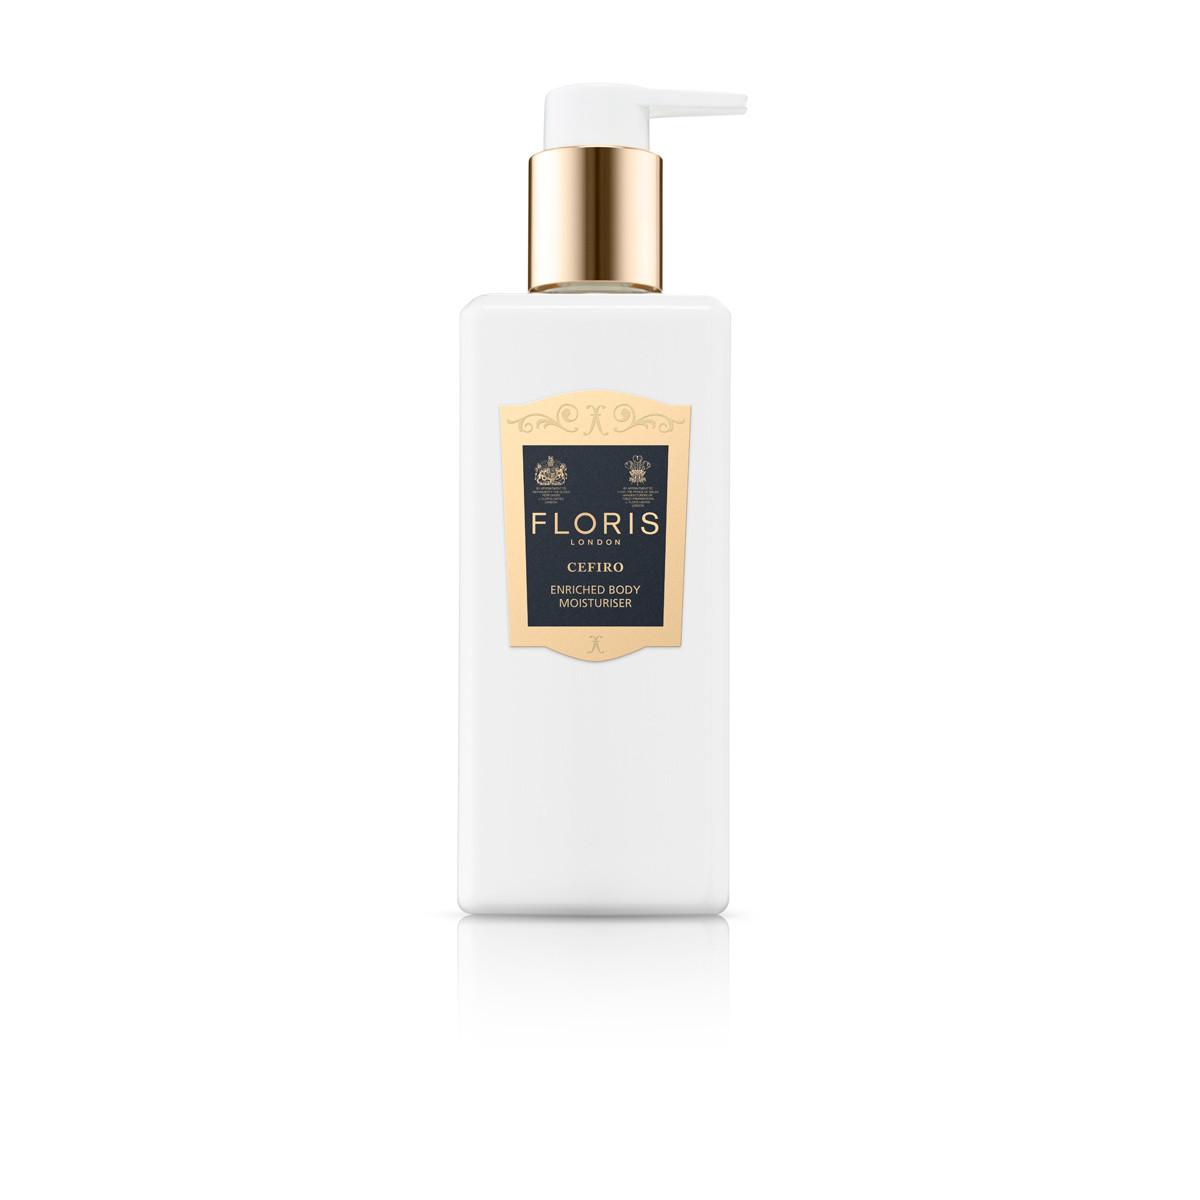 floris-cefiro-enriched-body-moisturiser-bodylotion